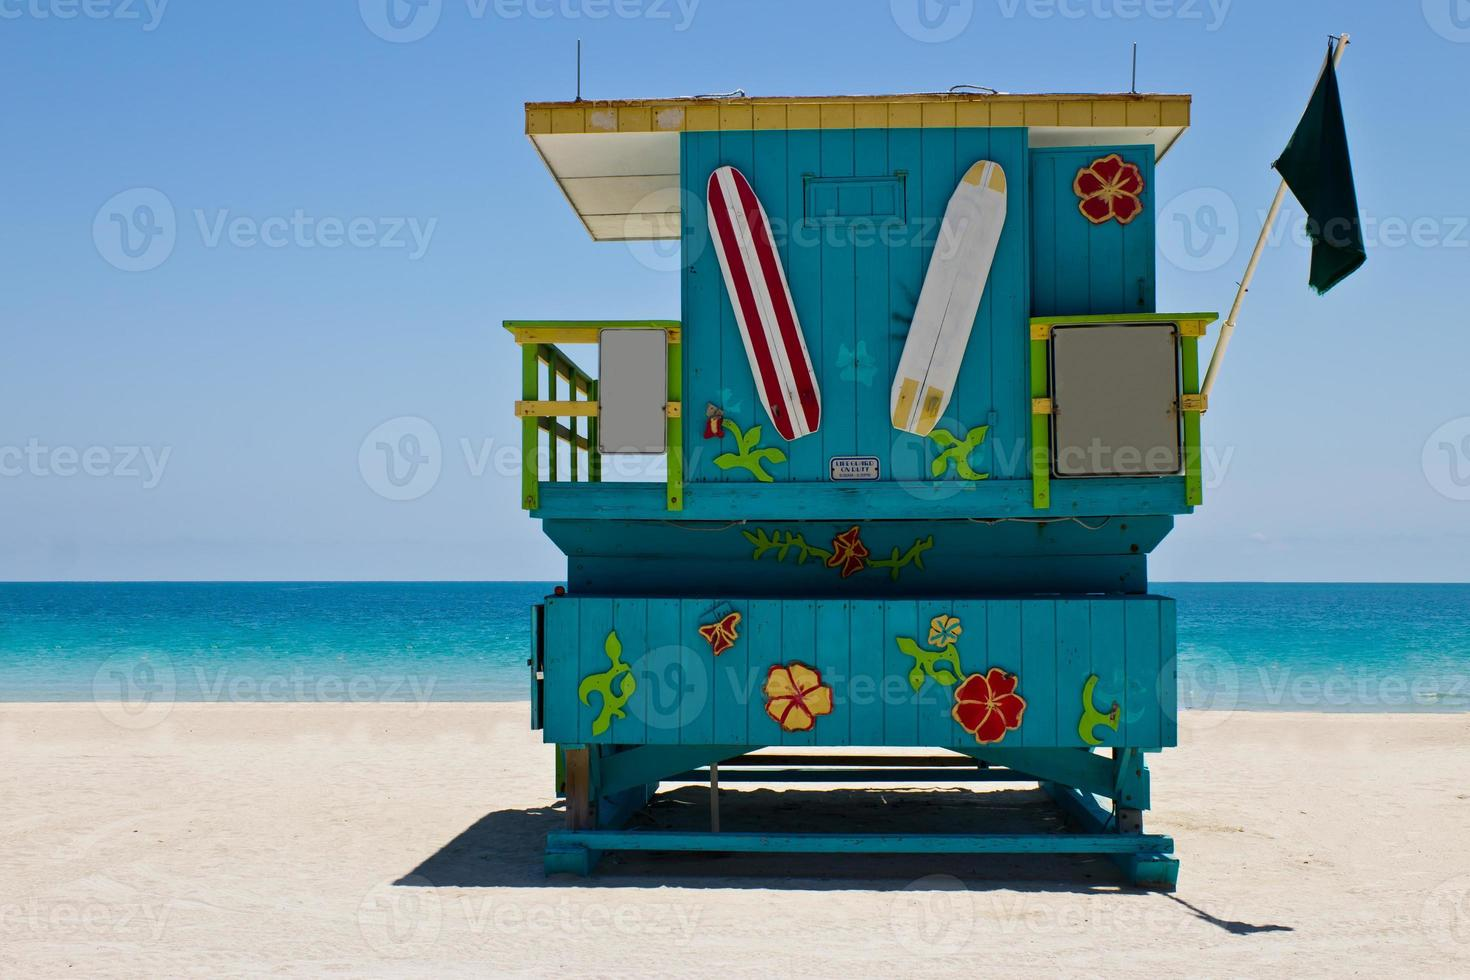 South Beach Rettungsschwimmerhütte in Miami, Florida foto